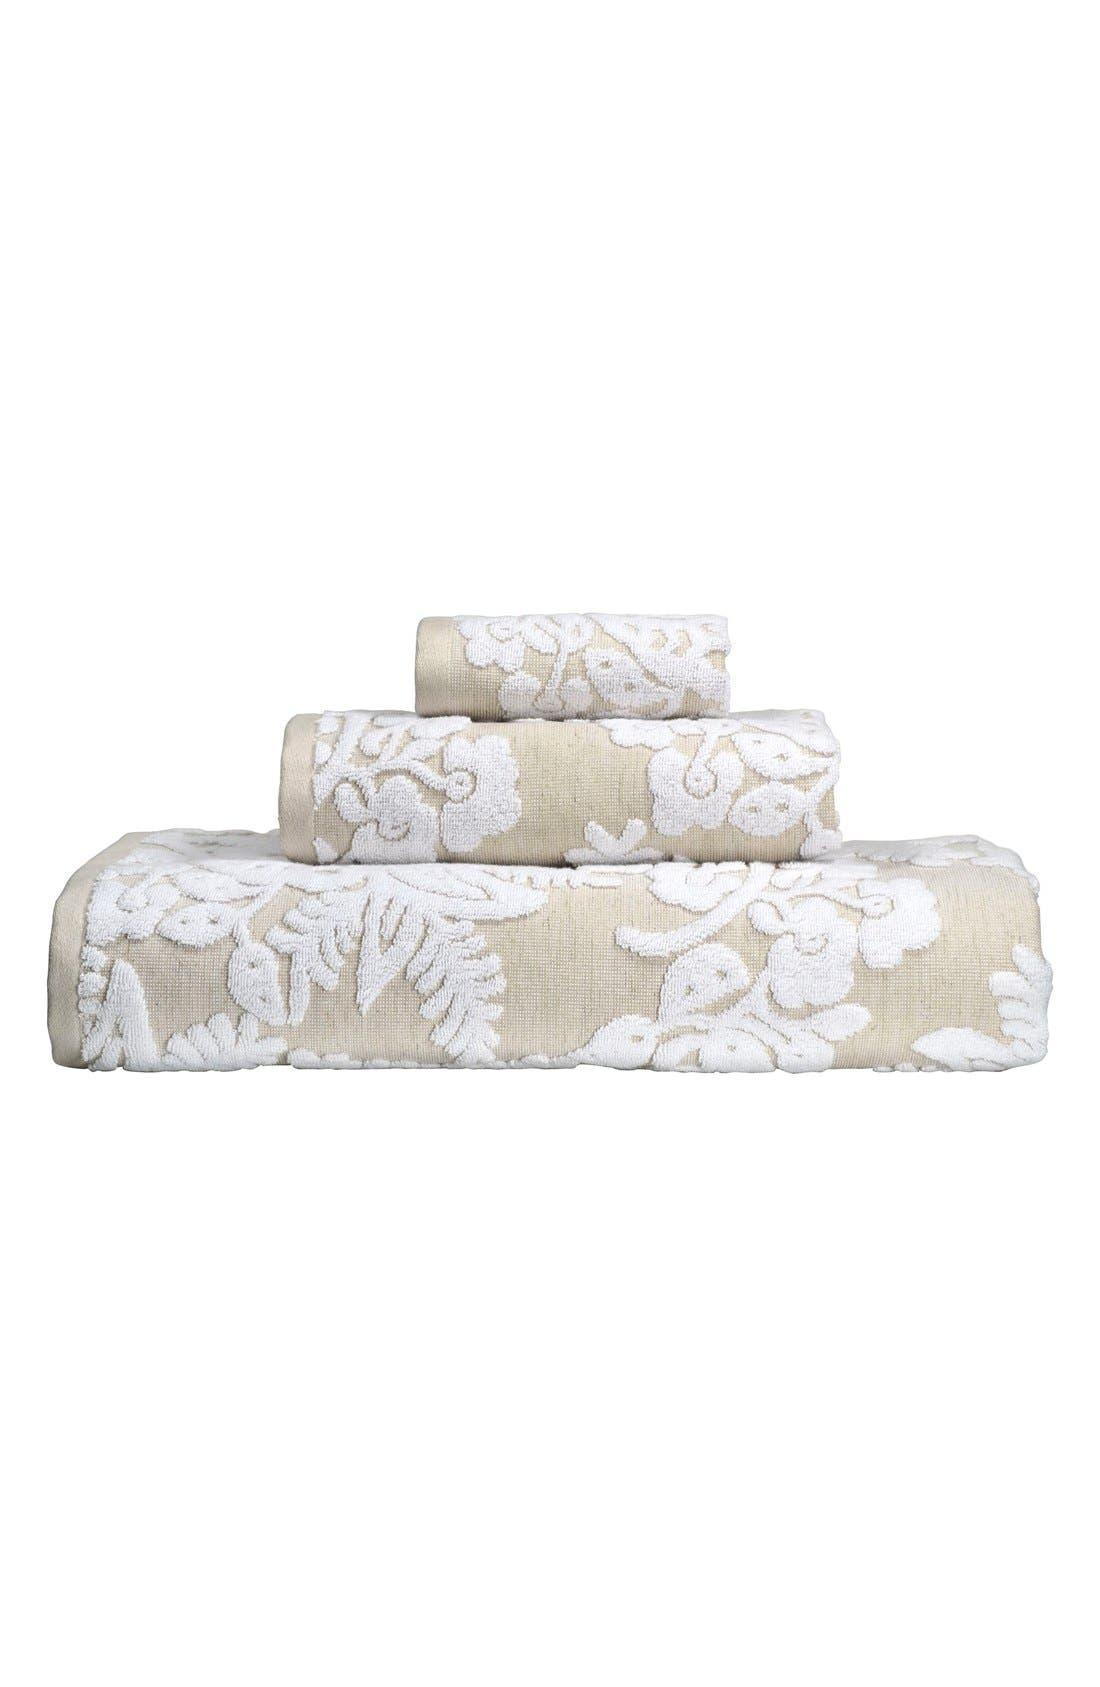 'Pasak' Bath Towel,                             Alternate thumbnail 2, color,                             100